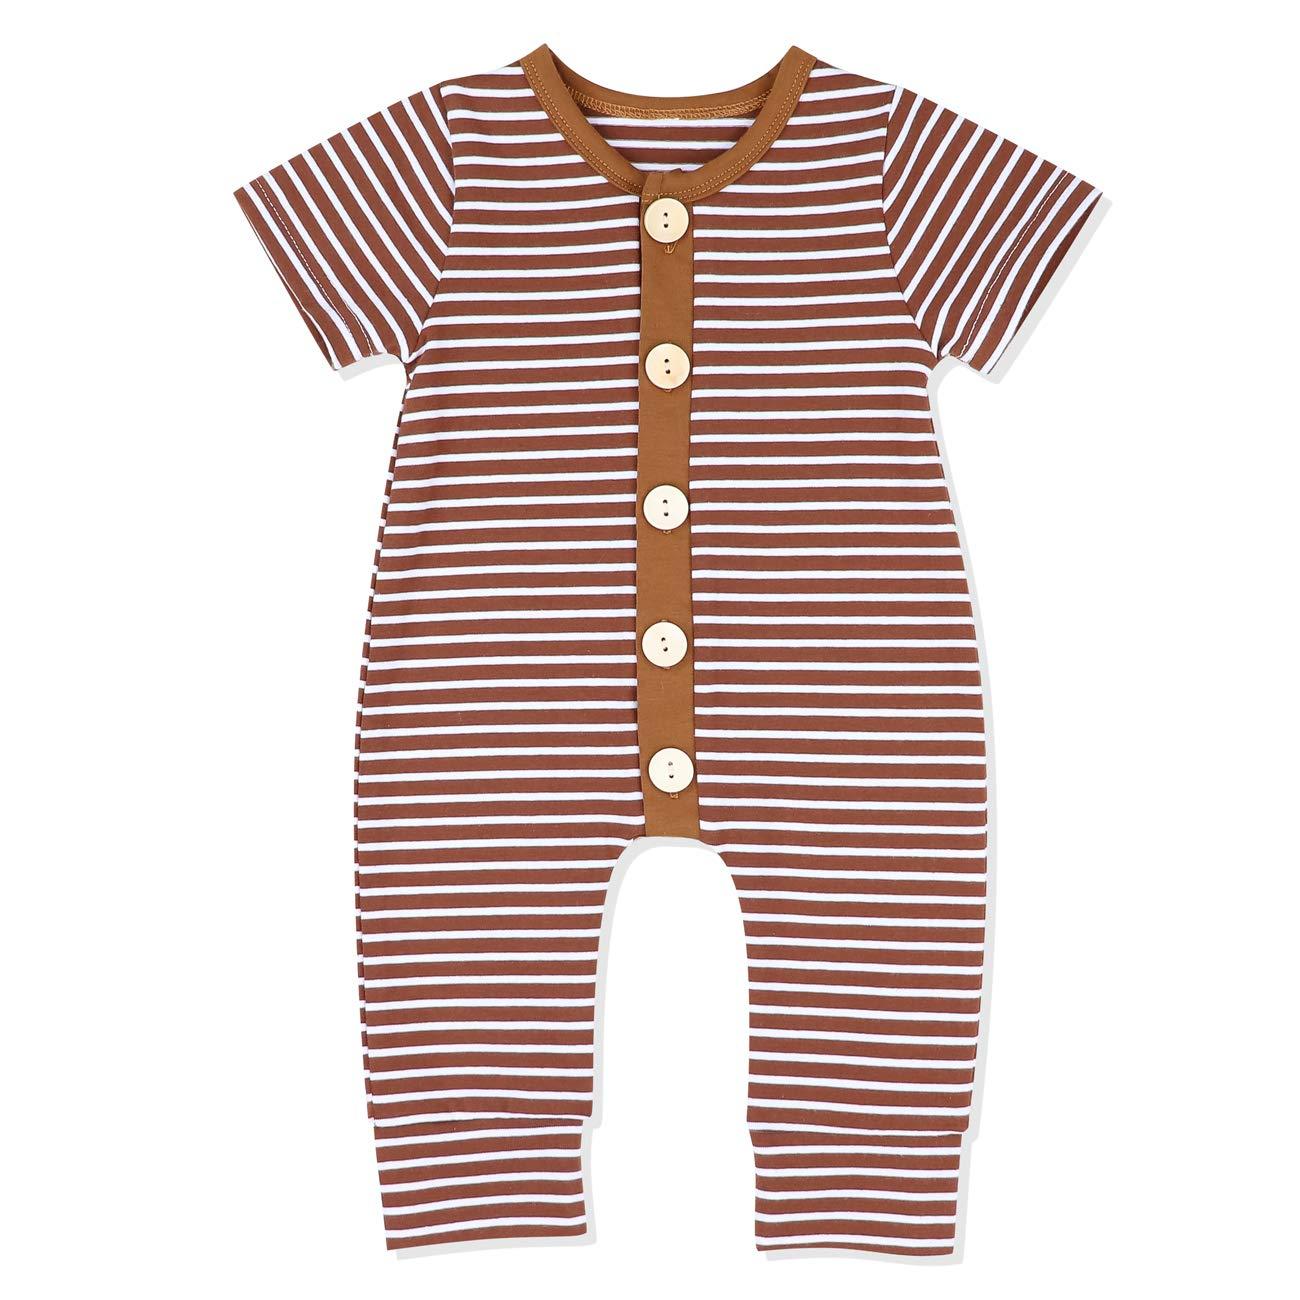 Newborn Baby Girls Ruffle Sleeve Romper Solid Onesie Jumpsuit with Headband Cotton Clothes Set